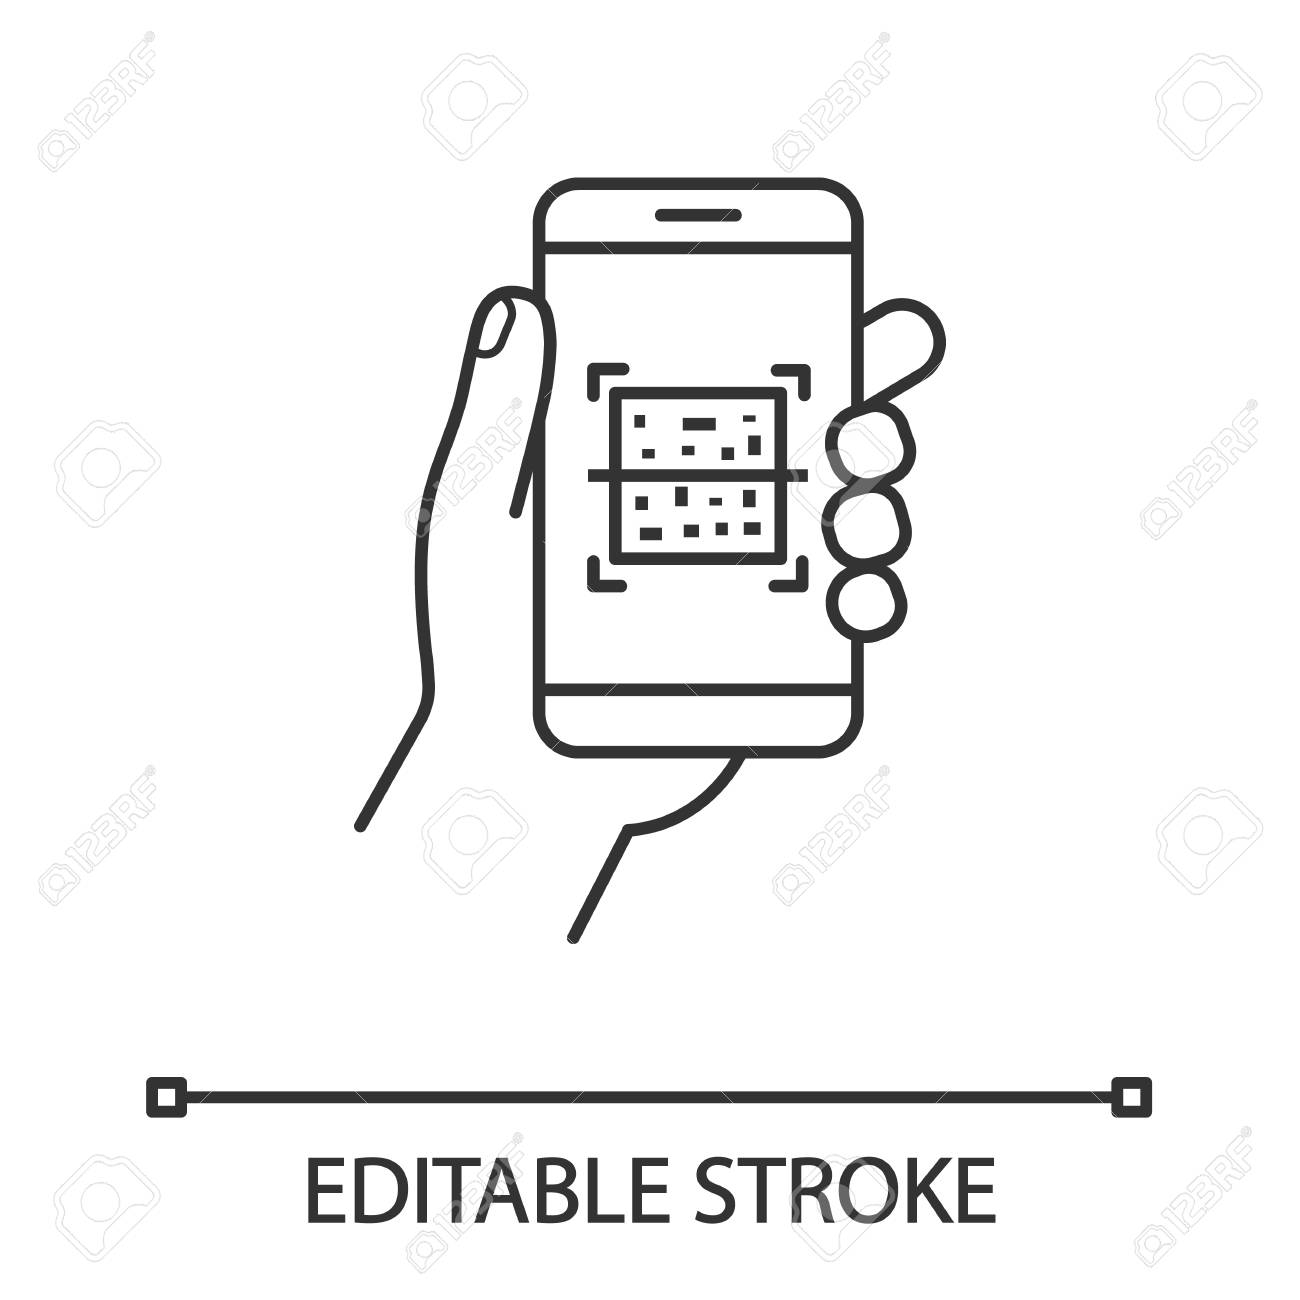 QR code smartphone scanner linear icon  Thin line illustration